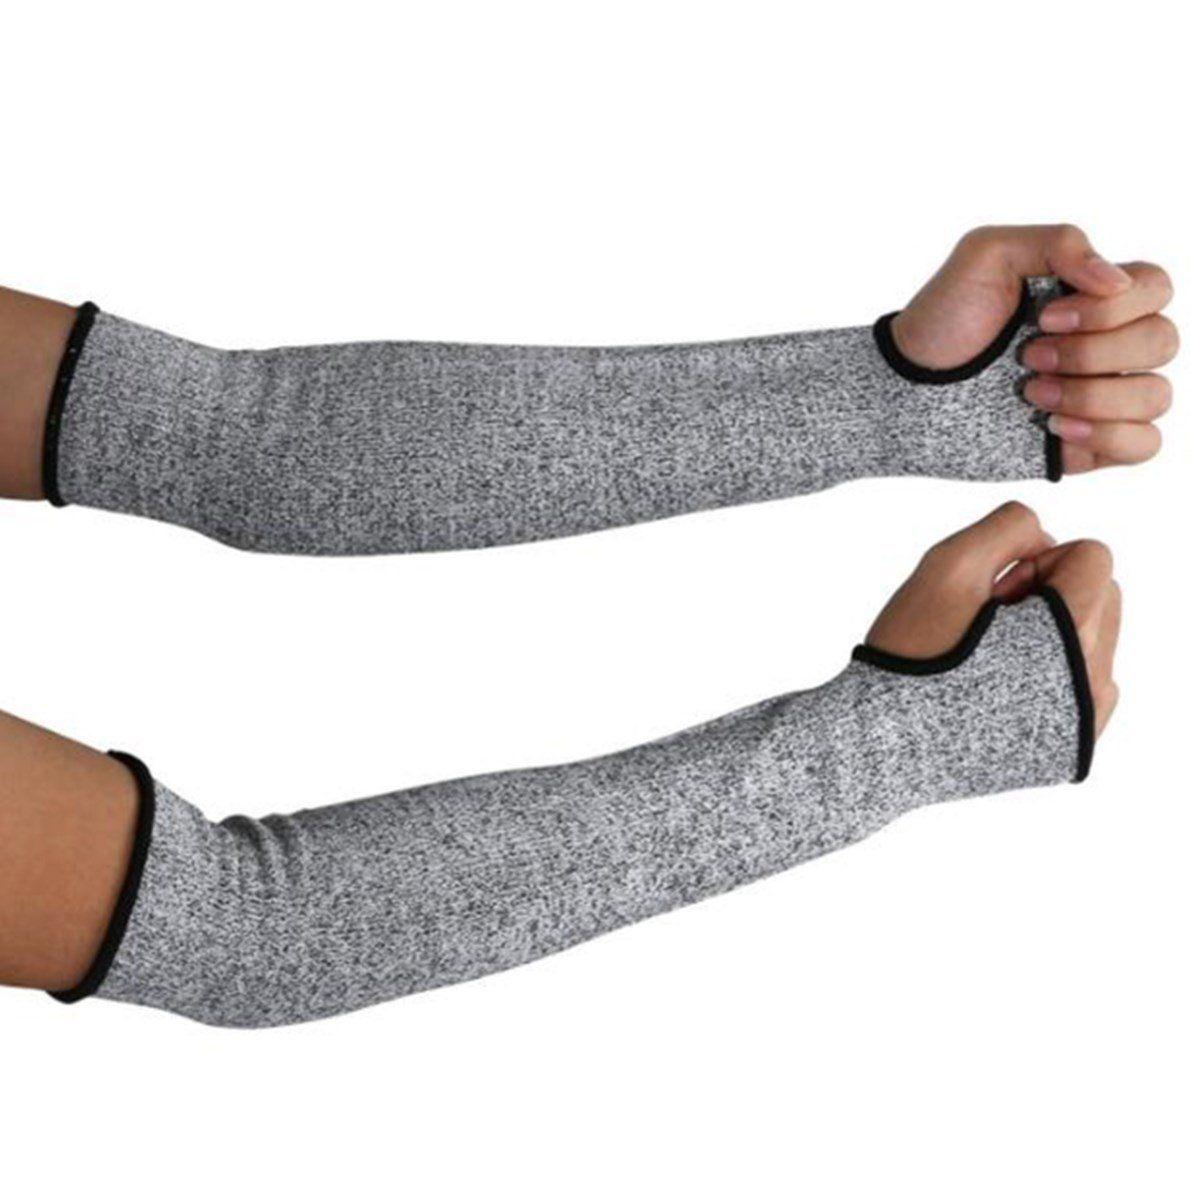 Protective Arm Sleeves Cut-resistant Armband Arm Guard Bracers Anti-Cut Burn